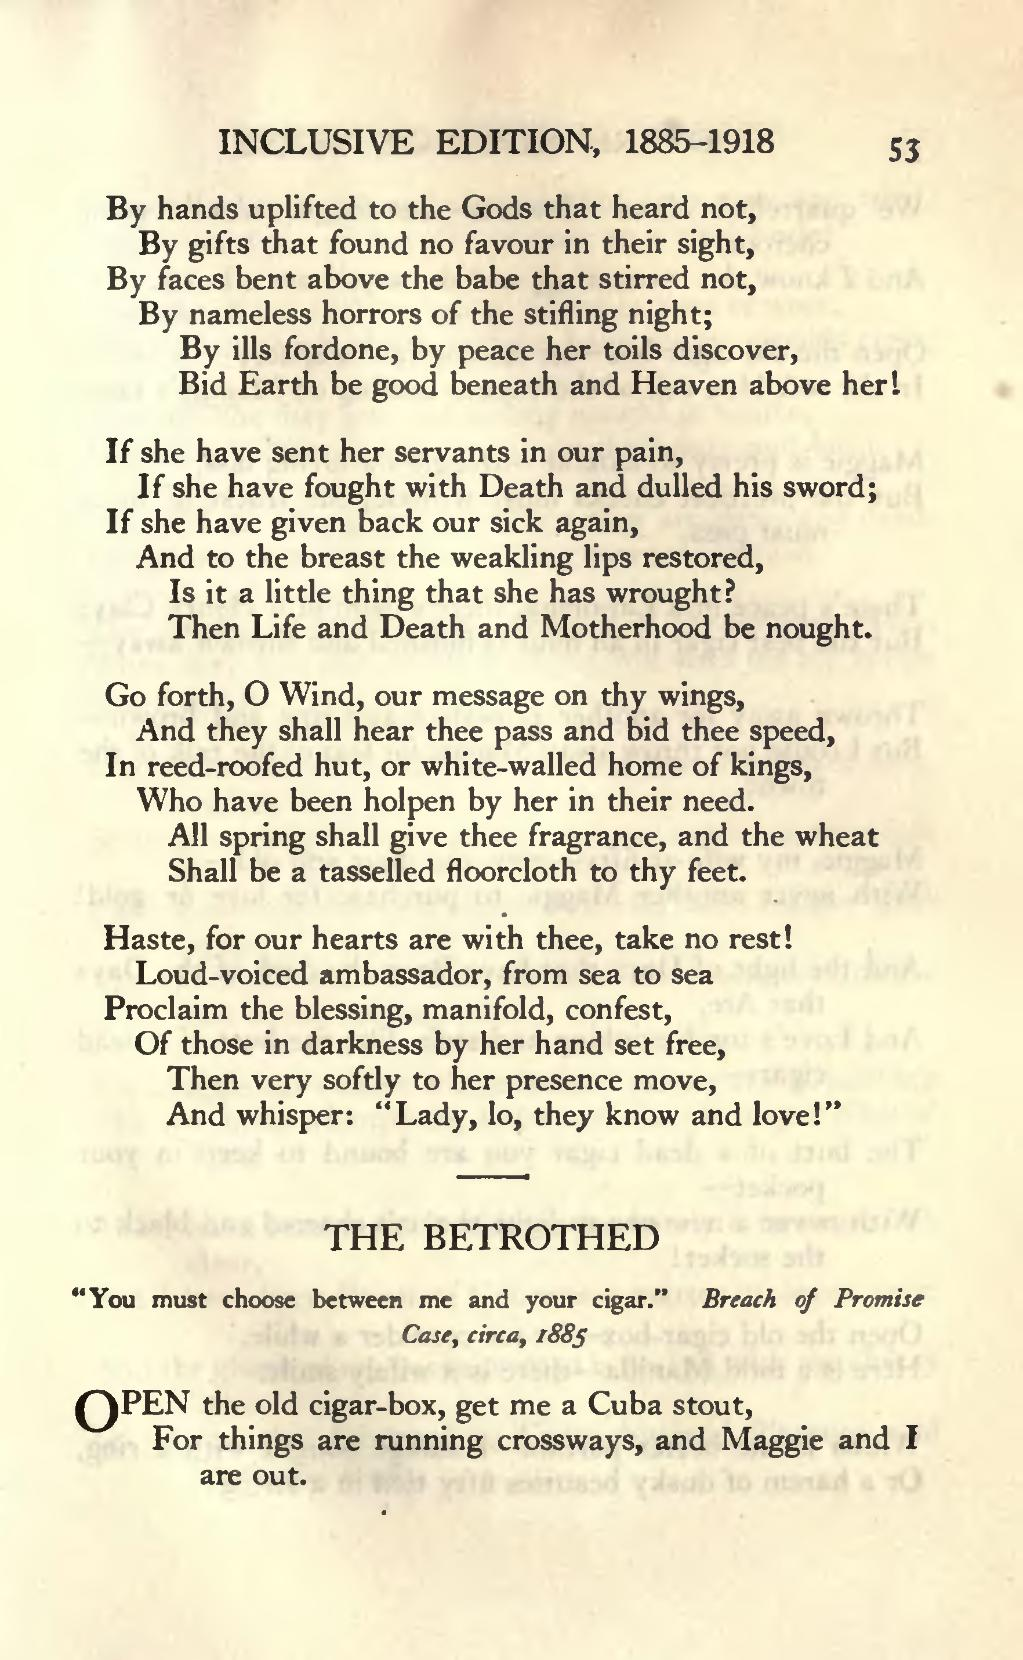 PageRudyard Kiplings Verse Inclusive Edition 1885 1918